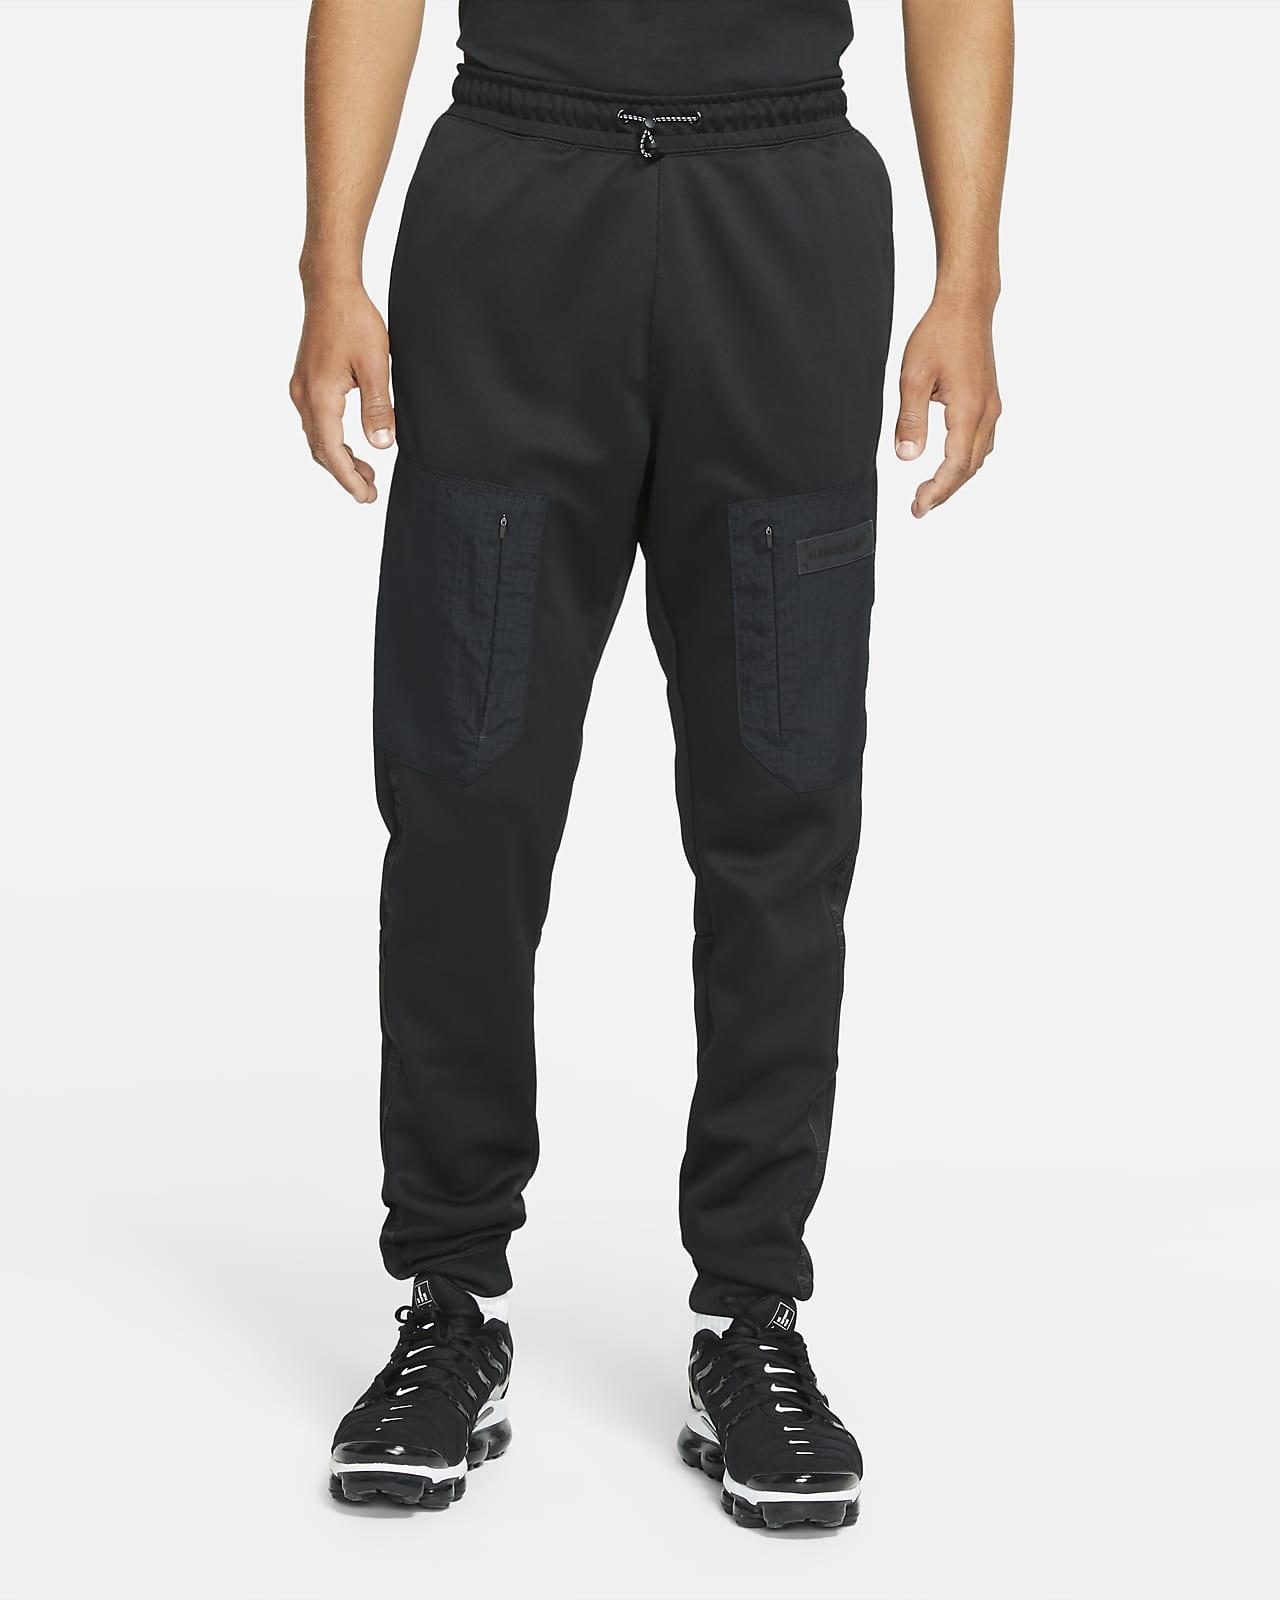 Nike Sportswear Air Max Men's Trousers. Nike PT